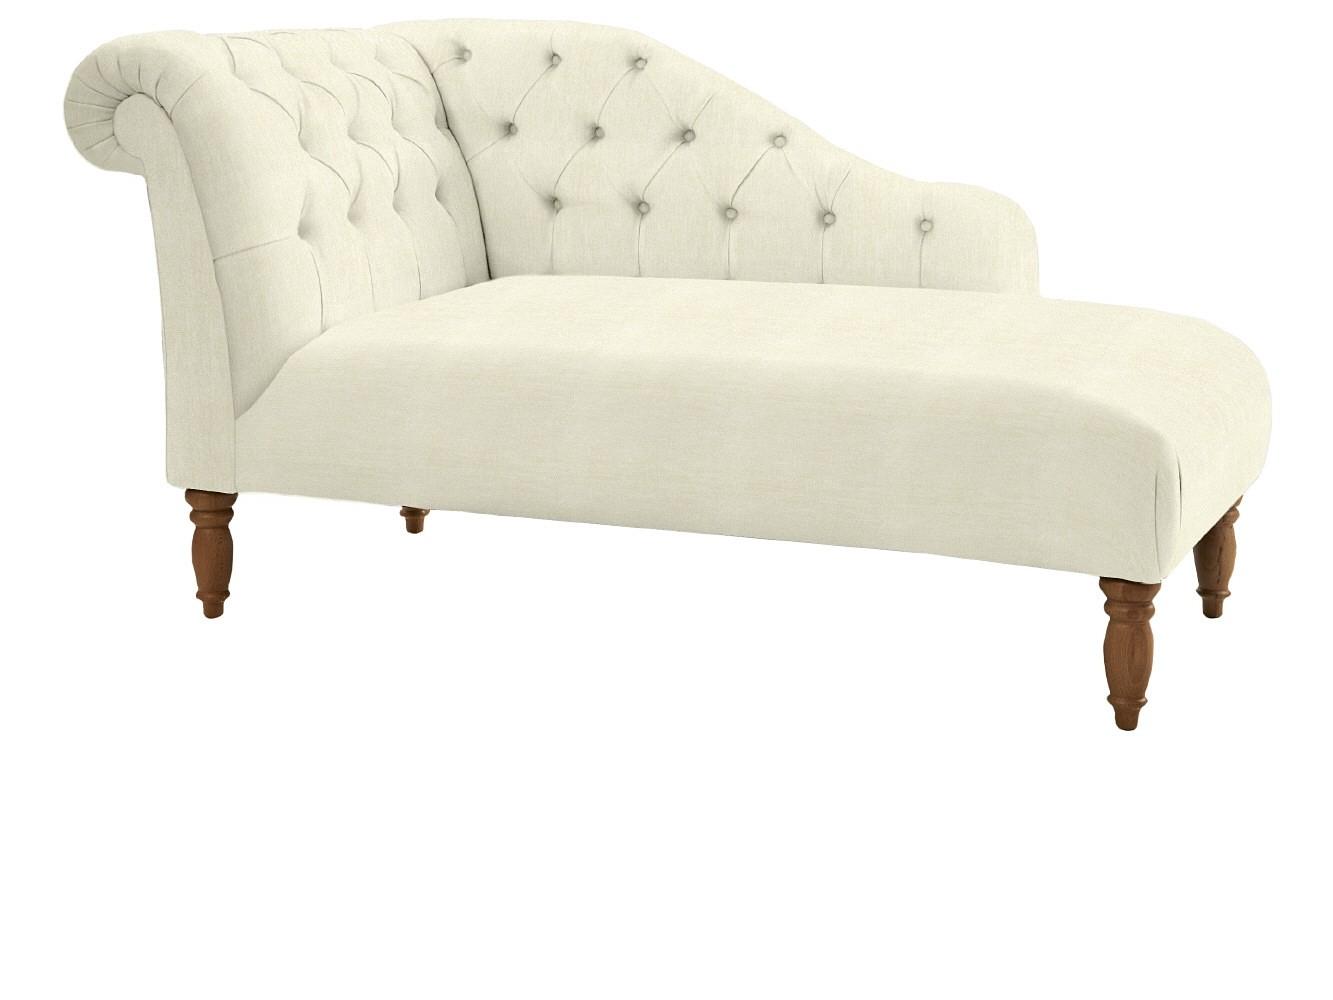 The Bingham Chaise Longue